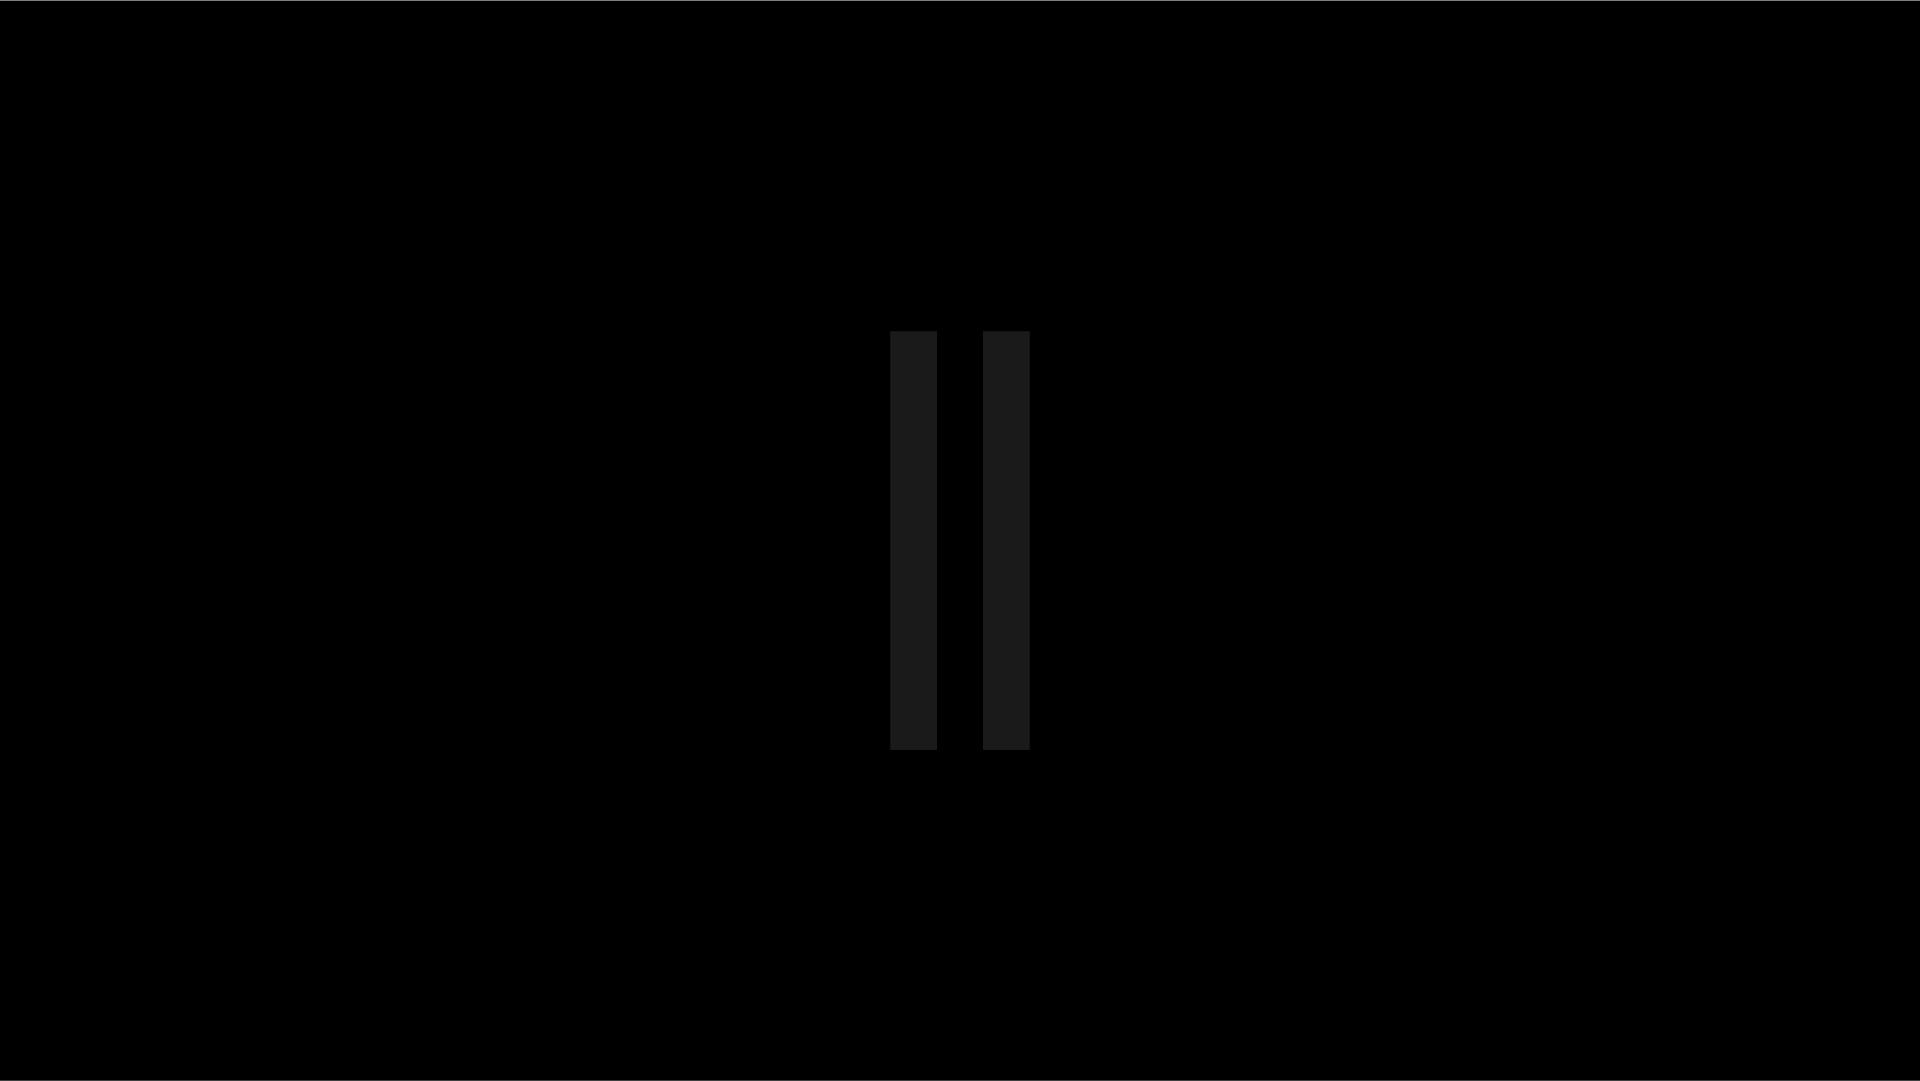 MAJID_JORDAN_logo_rviz_1.jpg